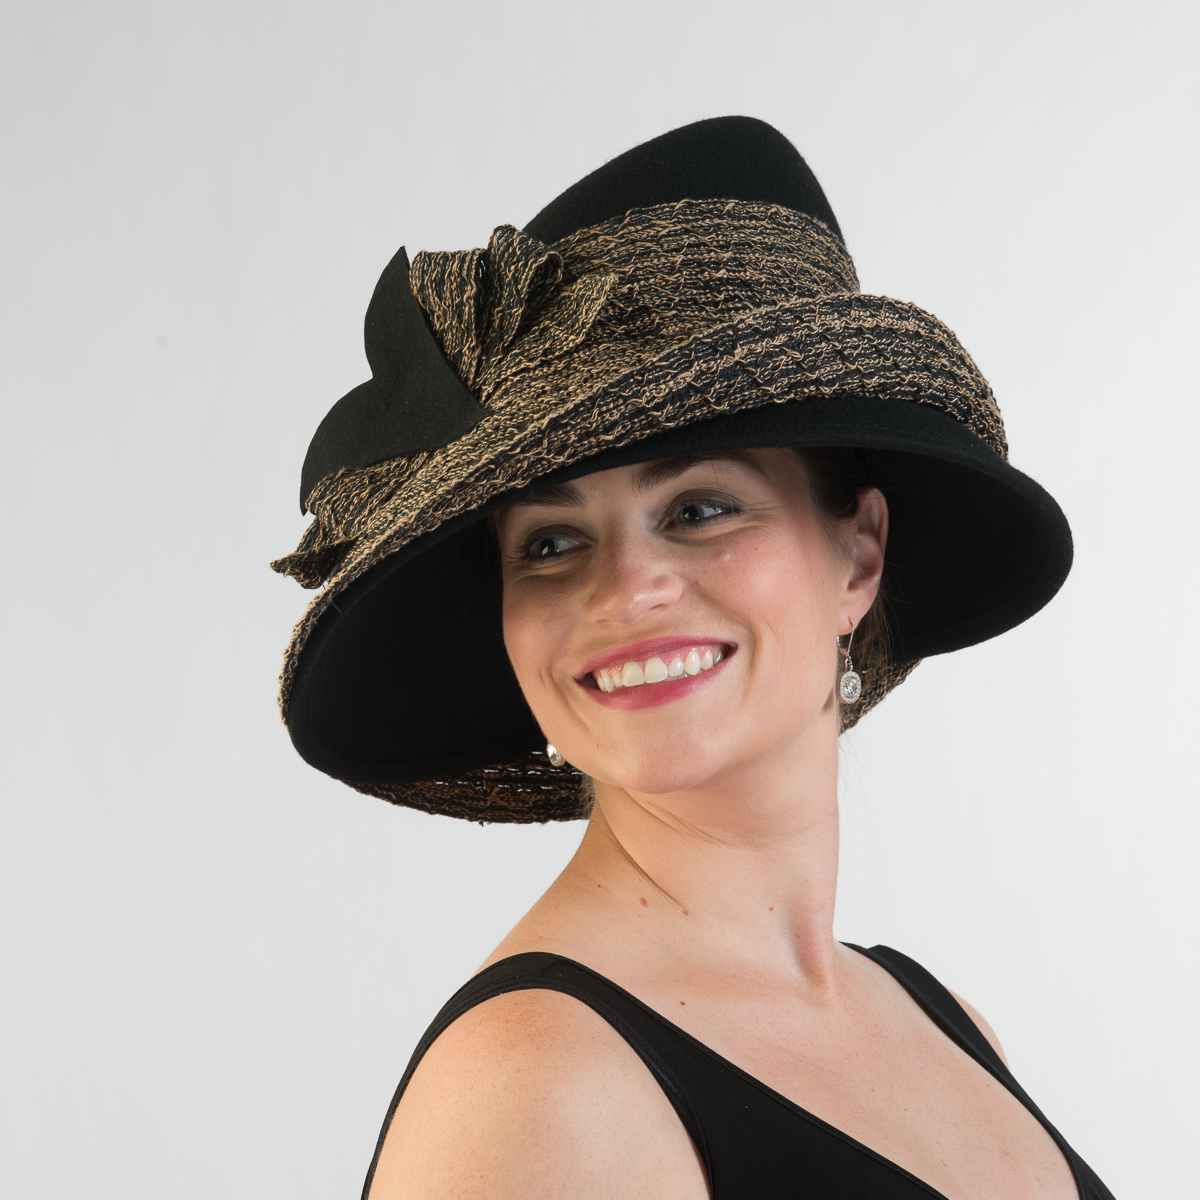 a81adc0e099 Black Tan Wool Felight Mix Braid Brim Hats Aj438f Bk Sun Yorkos